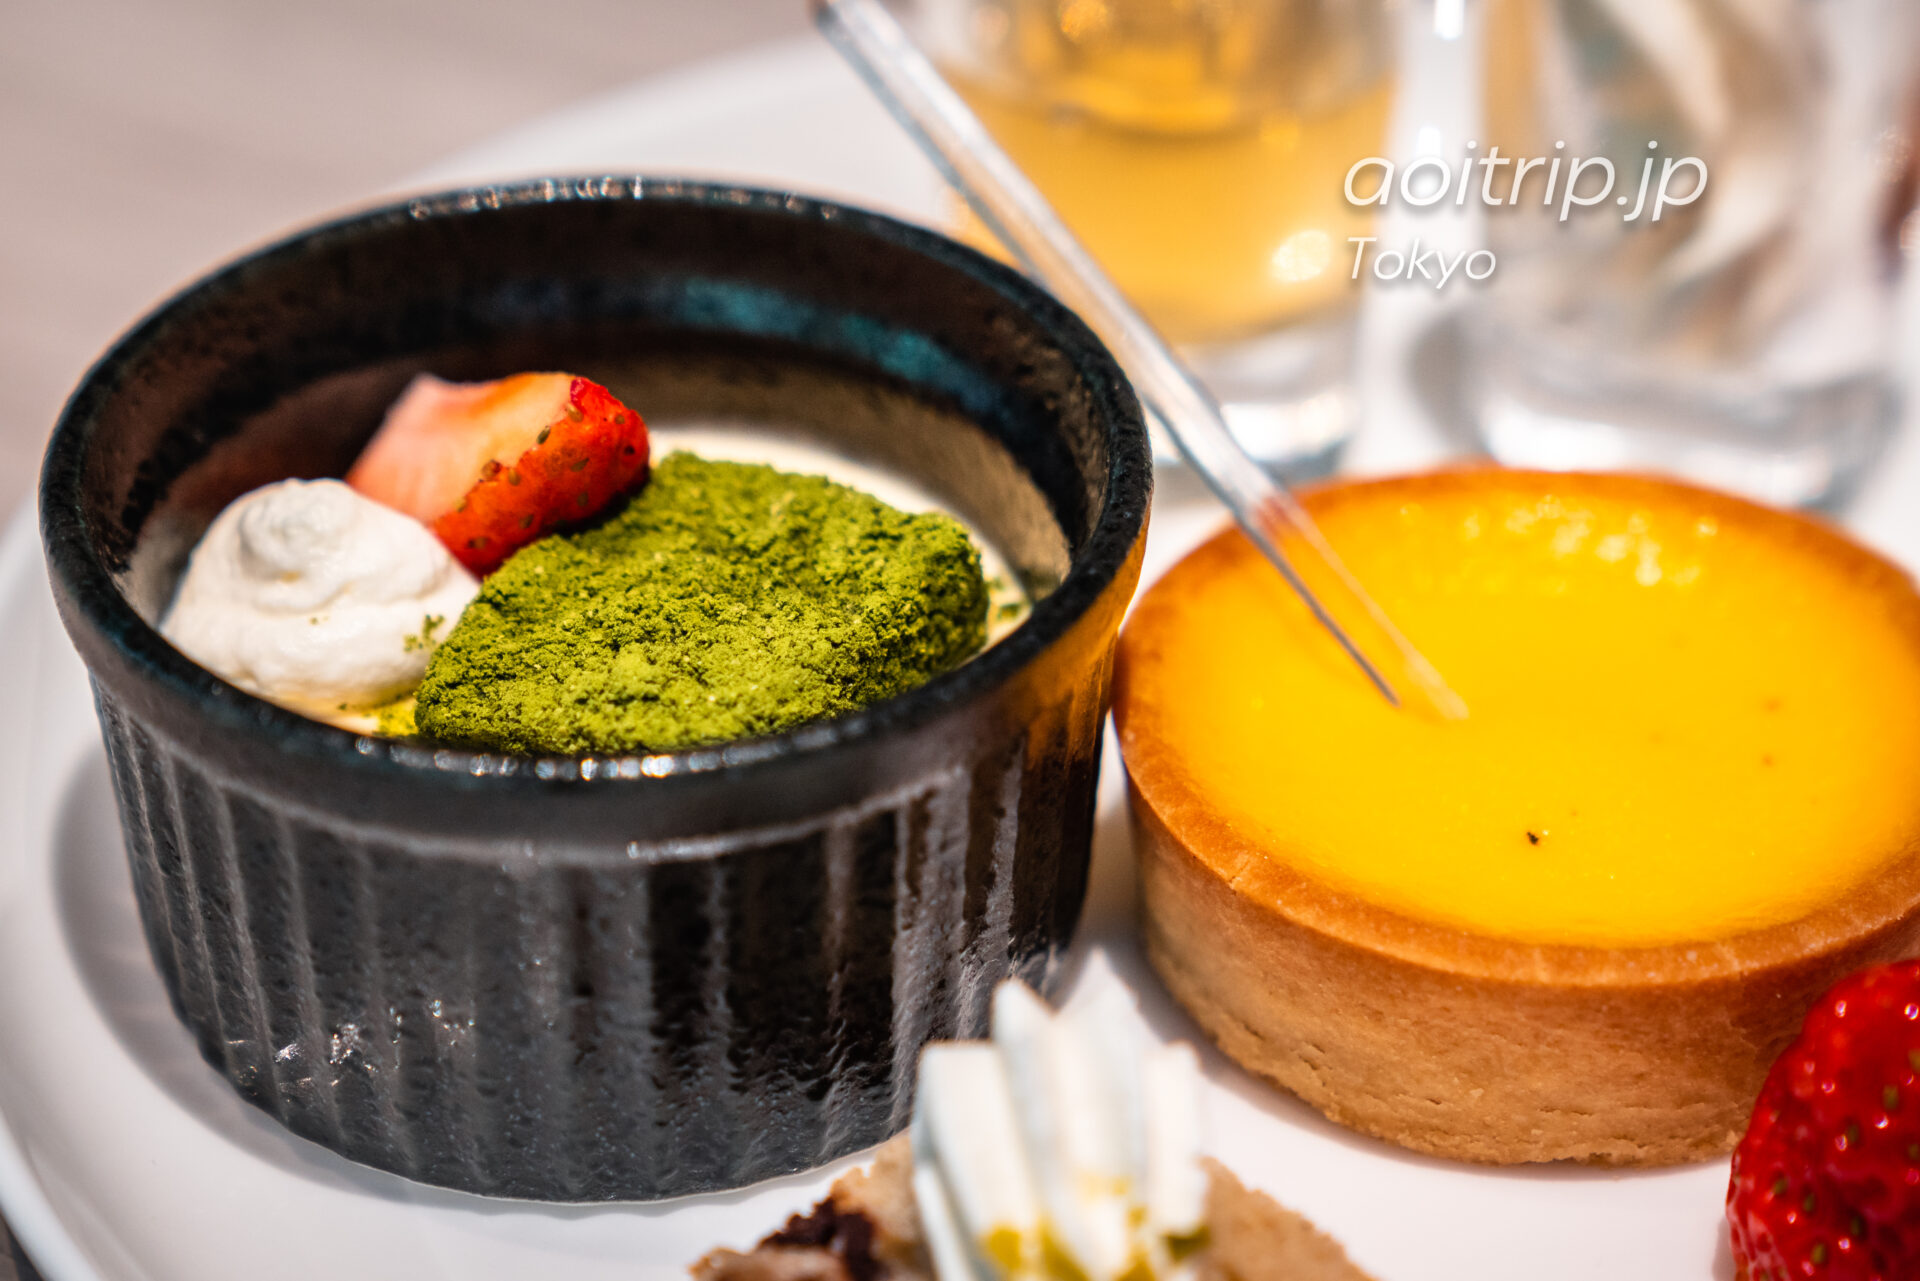 ACホテル東京銀座 AC Hotel Tokyo Ginza 朝食のナティージャ